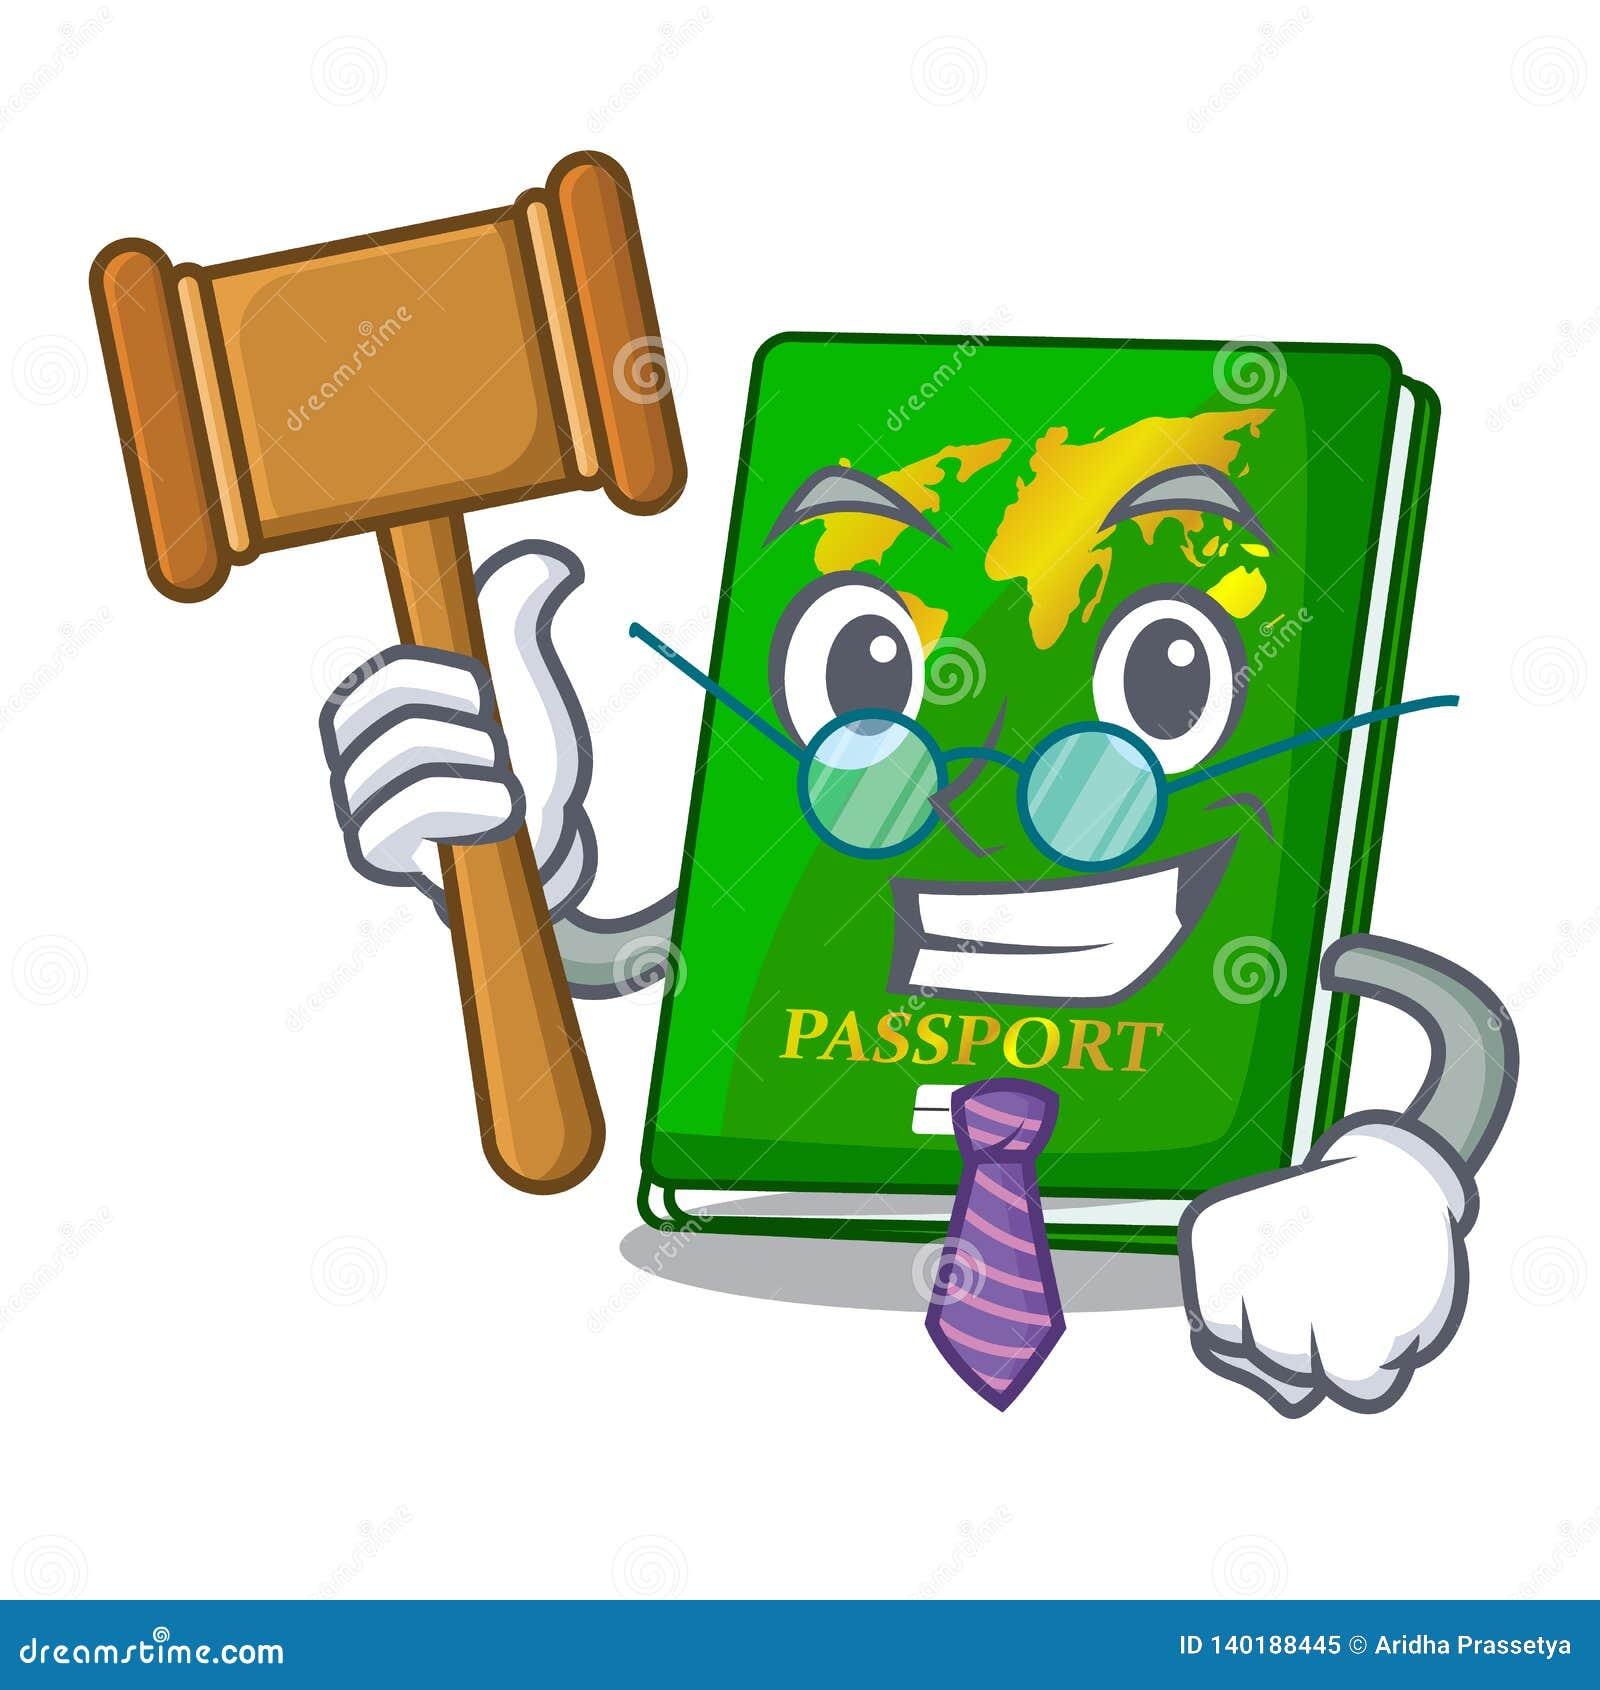 Паспорт зеленого цвета судьи на таблице талисмана